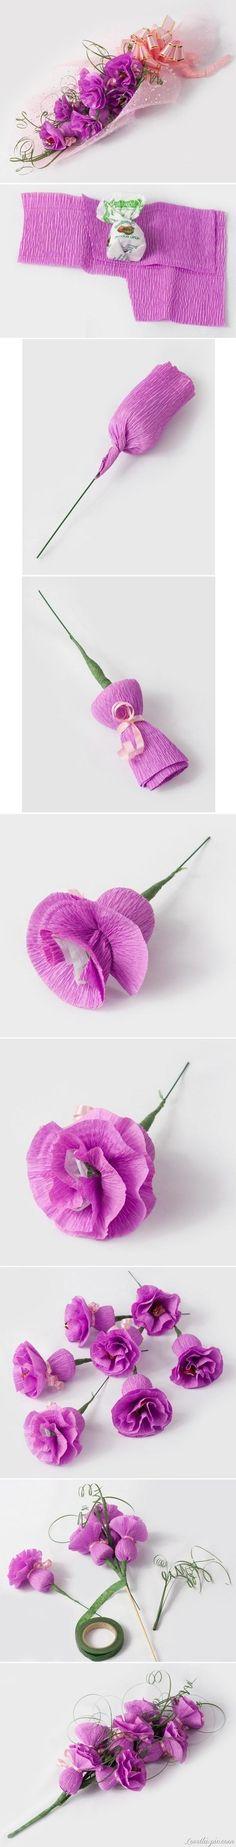 diy party favor bouquet bouquet diy handmade diy ideas diy projects diy craft craft flowers party crafts crafts craft ideas